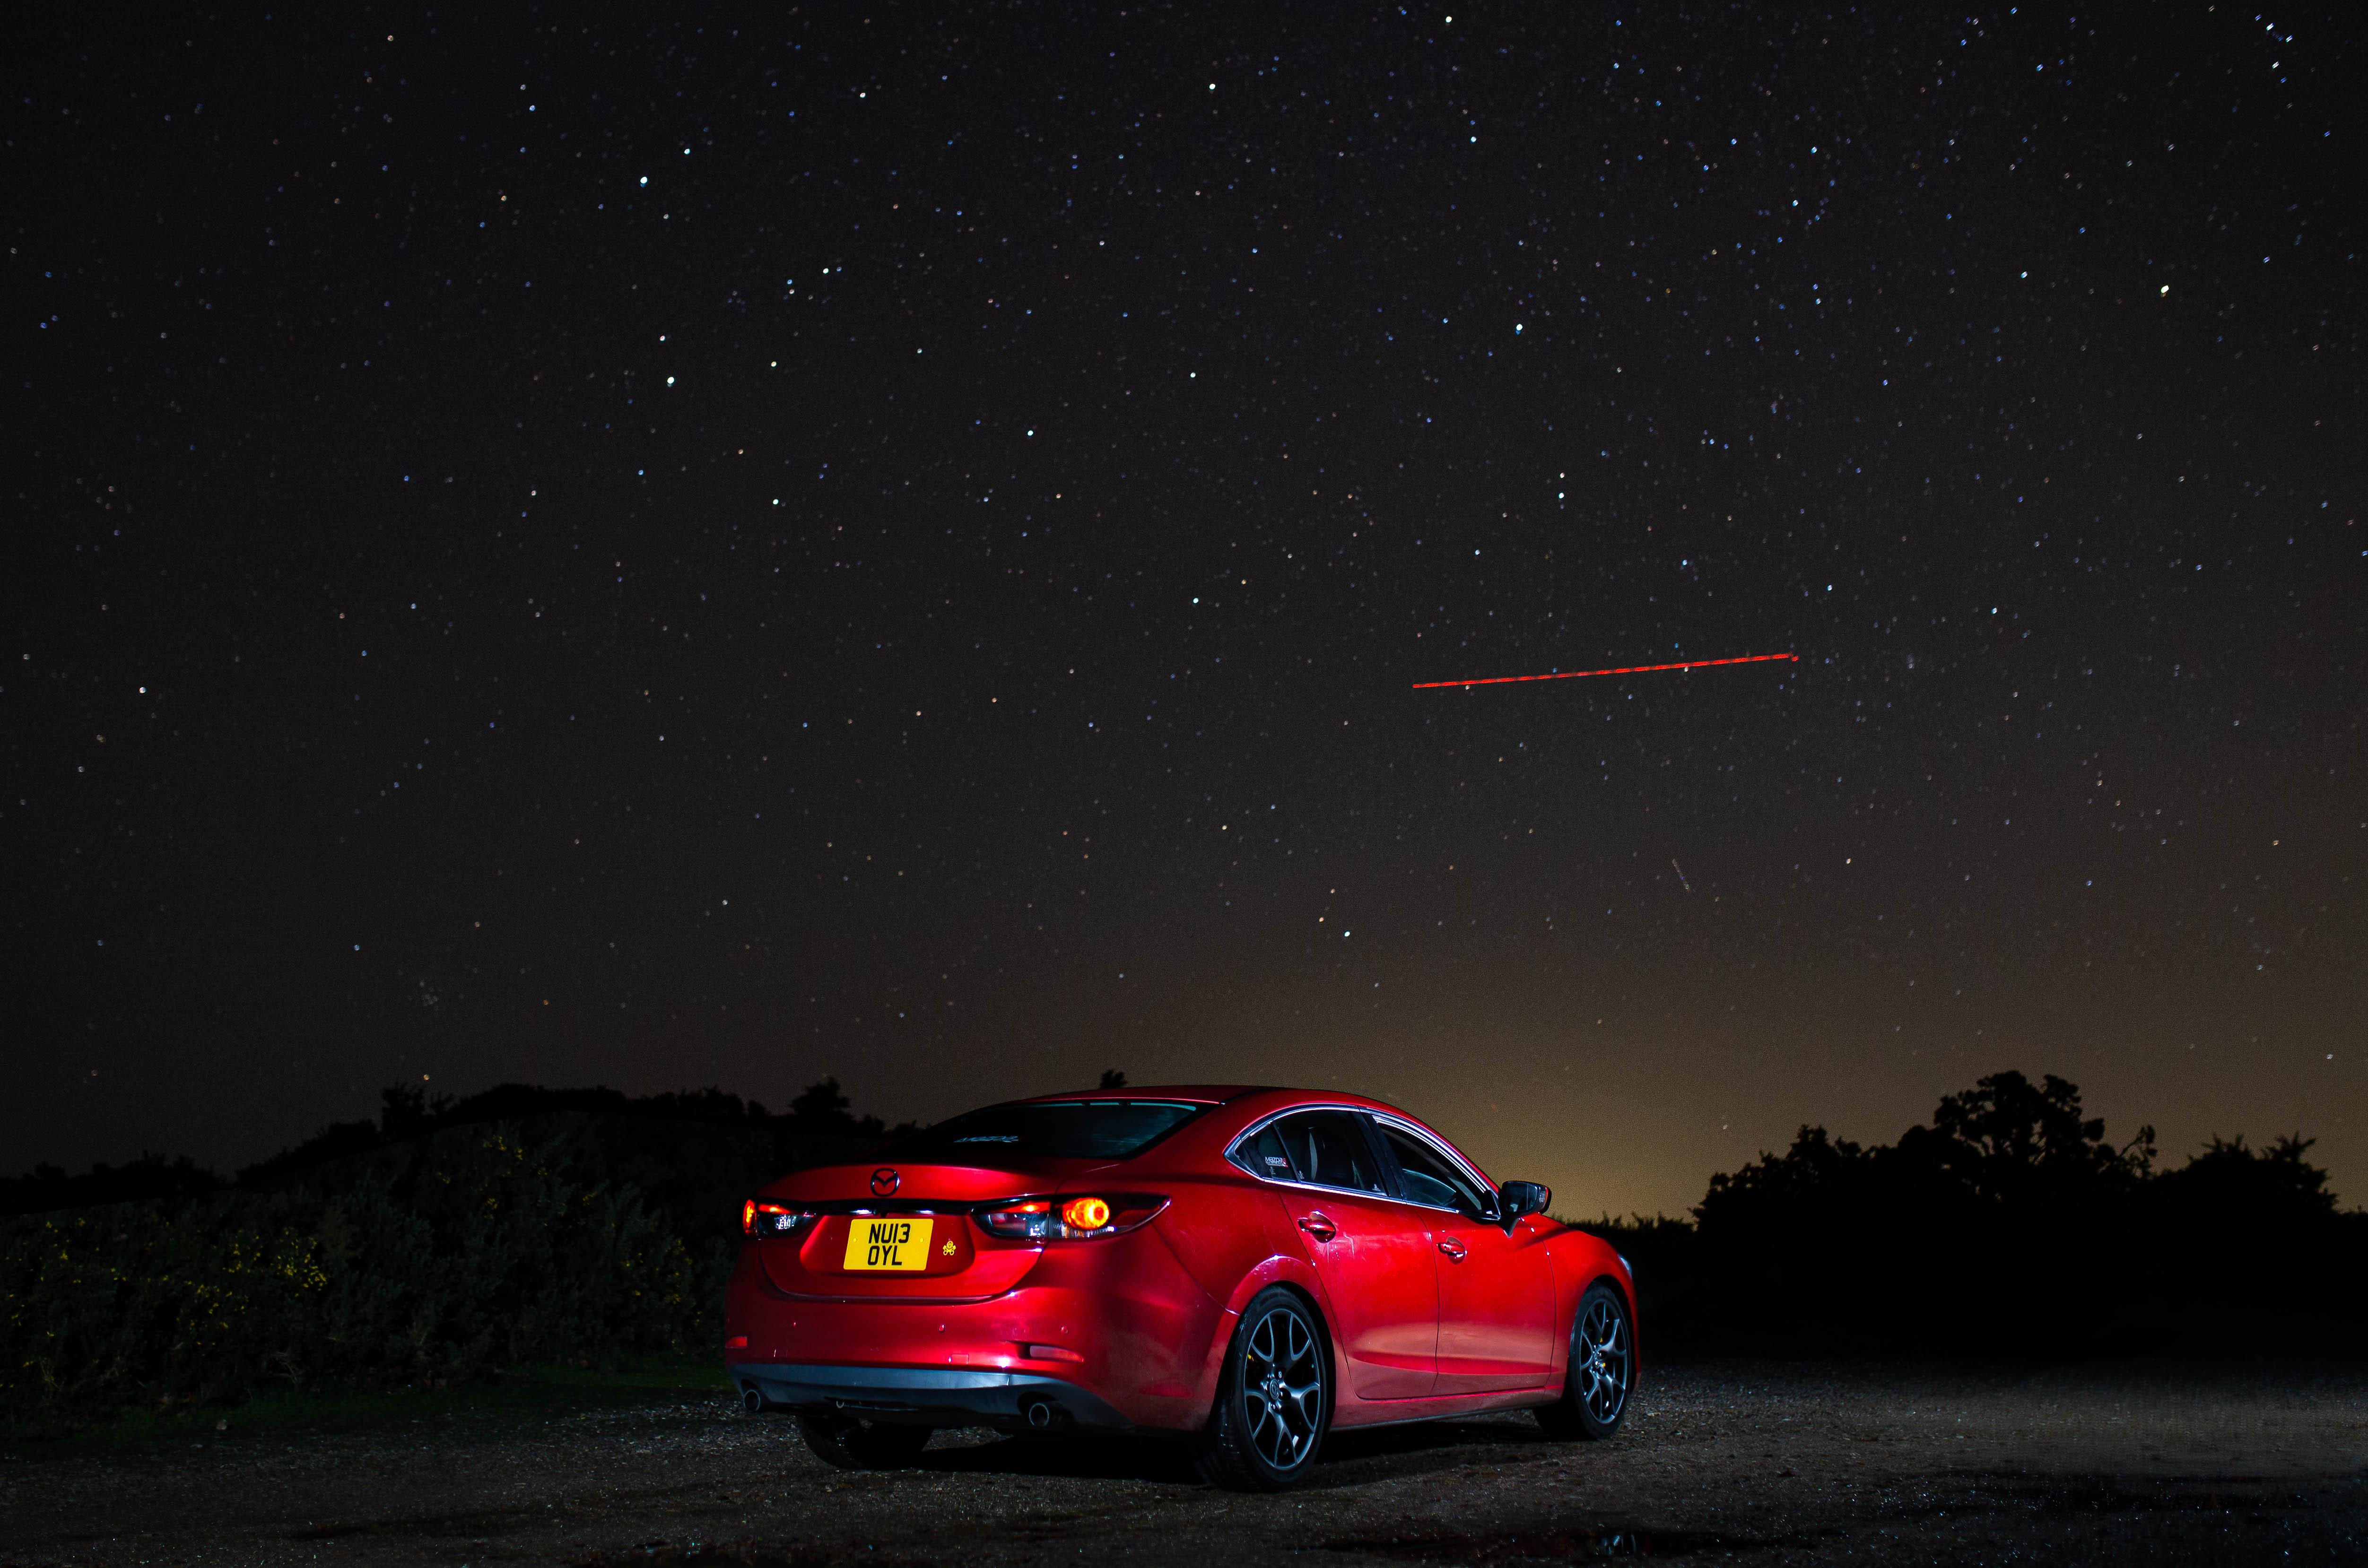 Star Gazing Photos Page 1 East Anglia Pistonheads Uk [ 3317 x 5008 Pixel ]